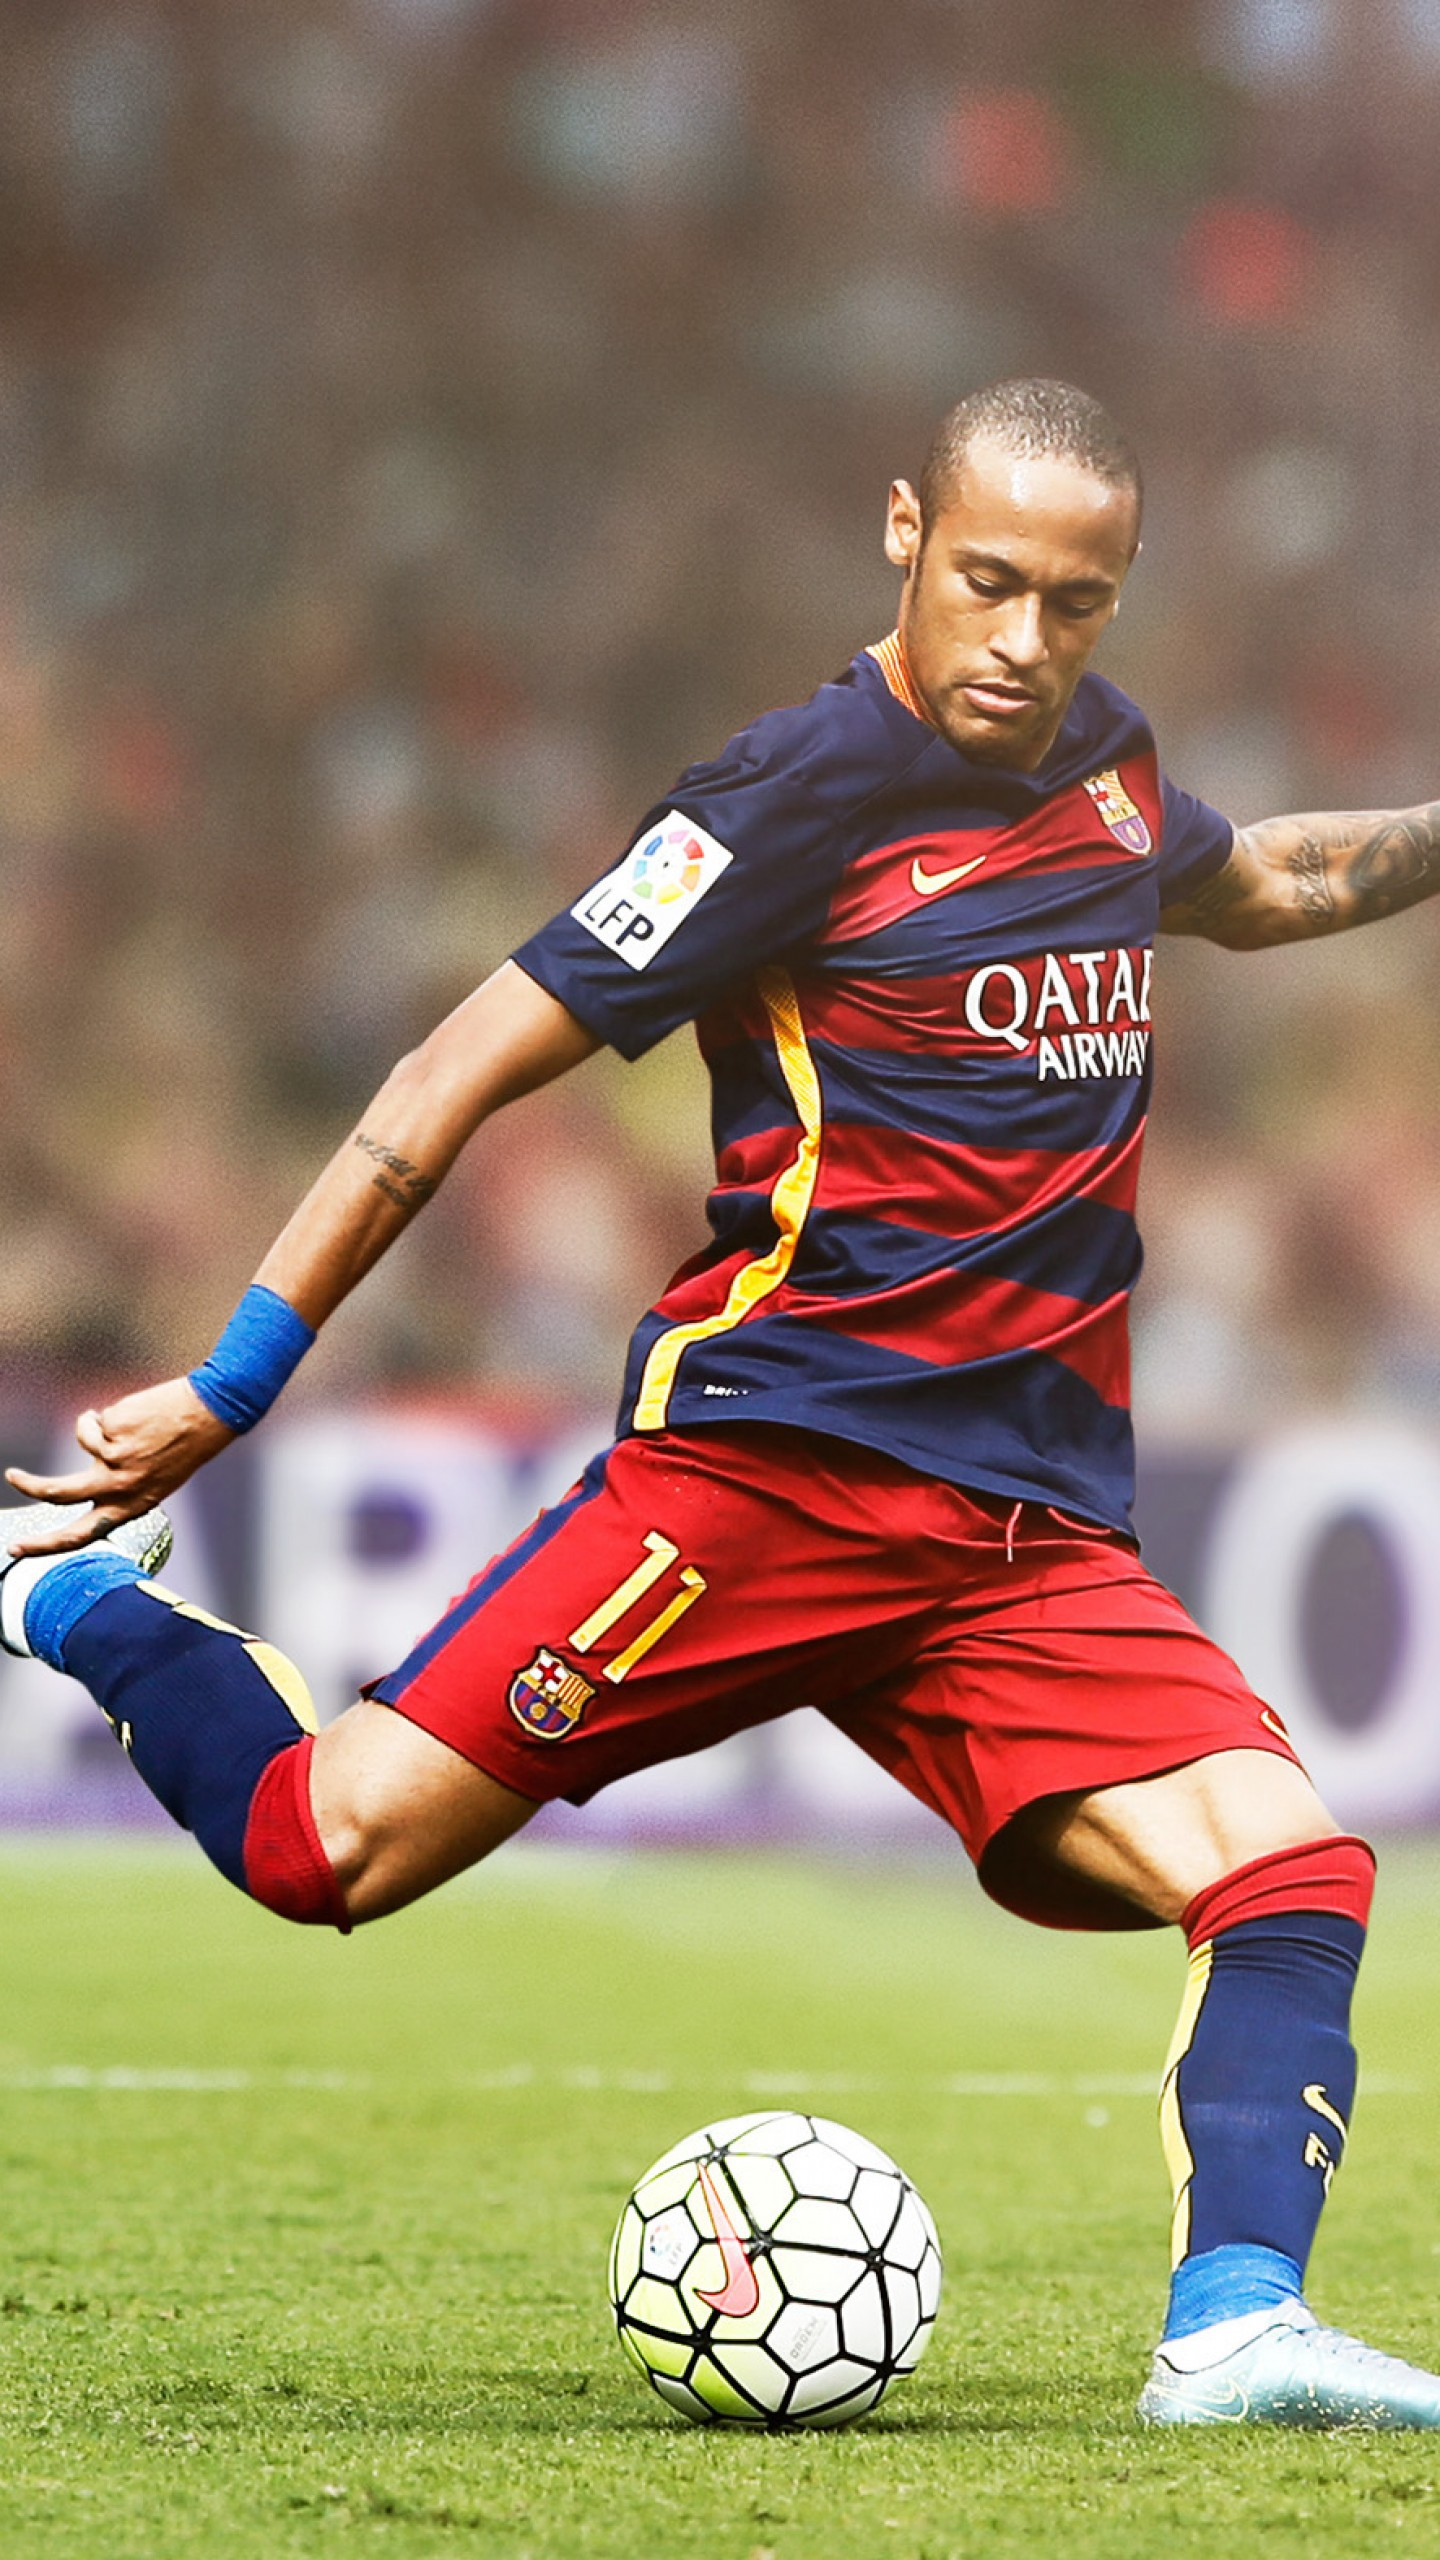 عکس زمینه نیمار با لباس تیم بارسلونا پس زمینه